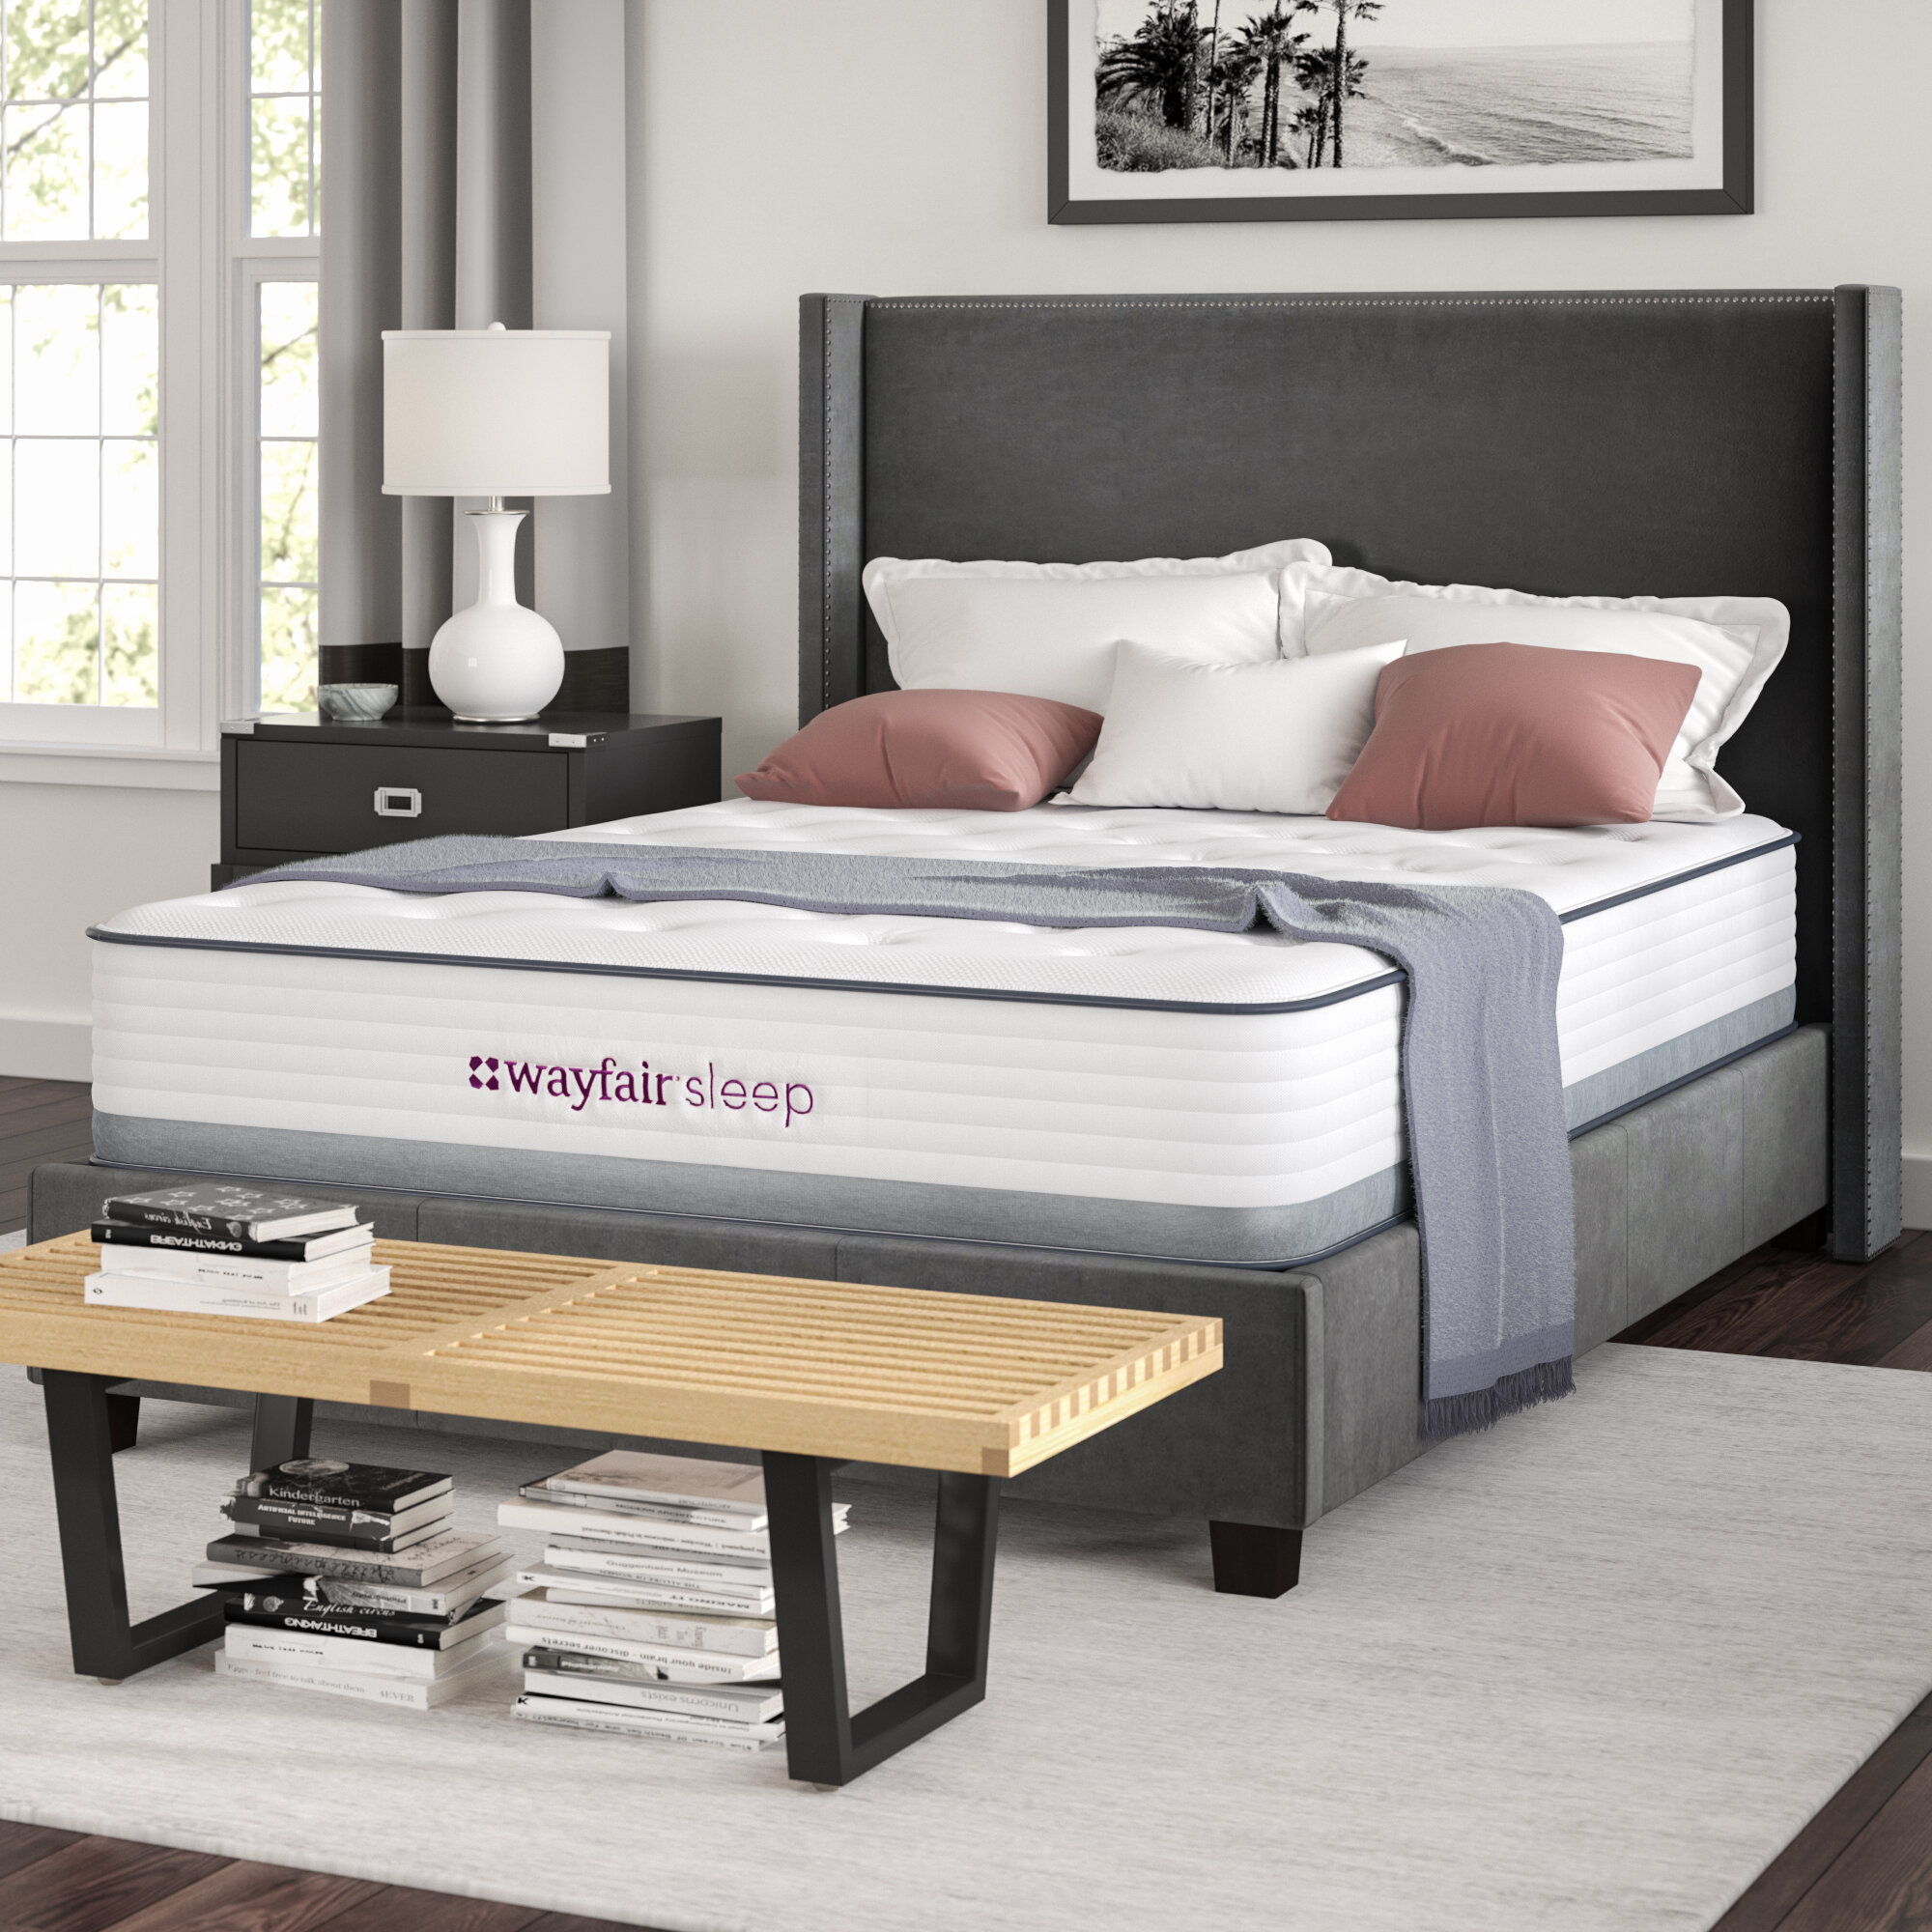 Wayfair Sleep 9 Plush Hybrid Mattress Reviews Wayfair